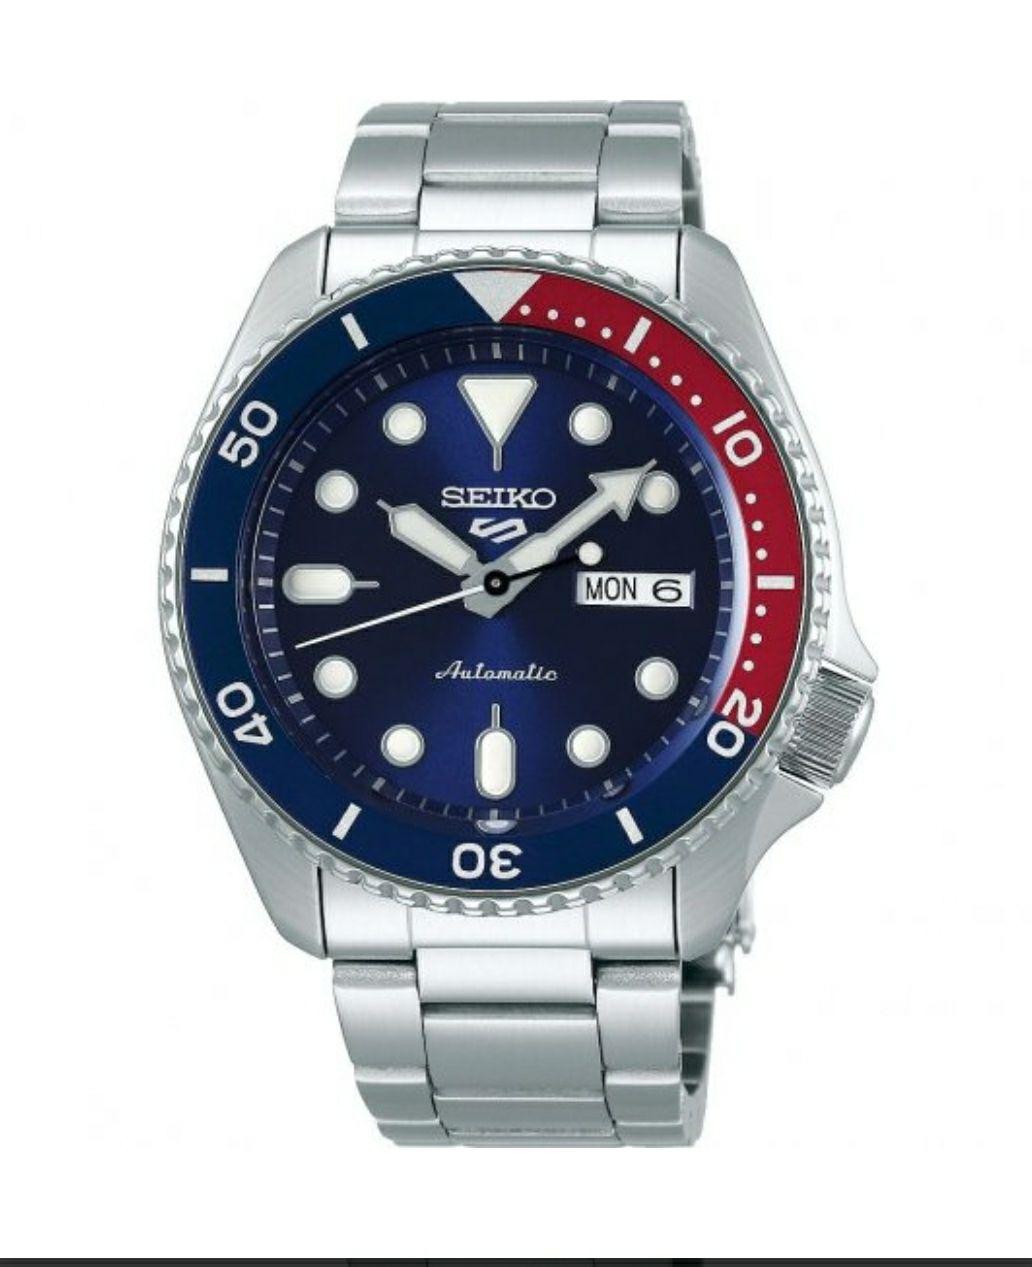 Seiko 5 Pepsi SRPD53K1 £150 @ The watch hut